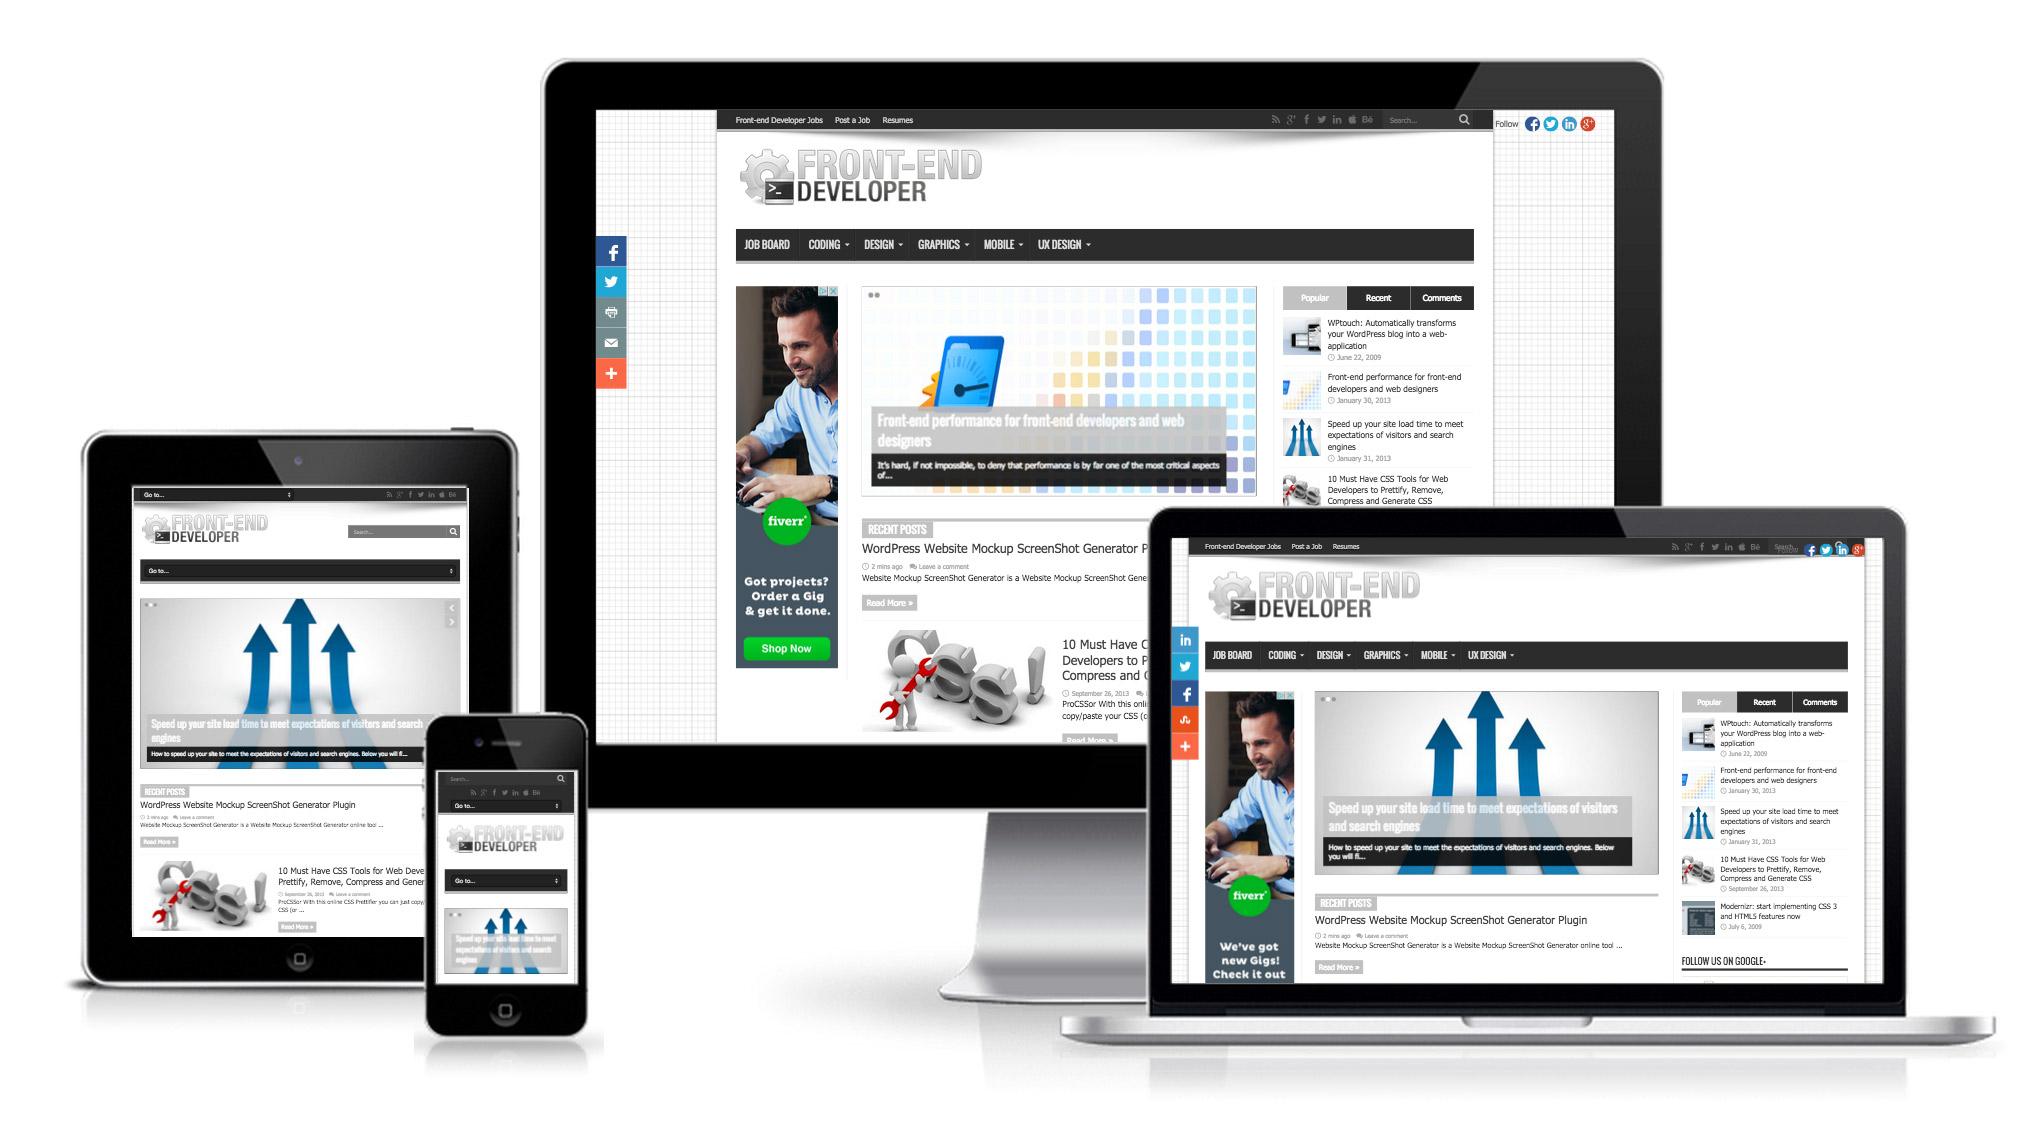 Website Design From Home Job Trend Home Design And Decor